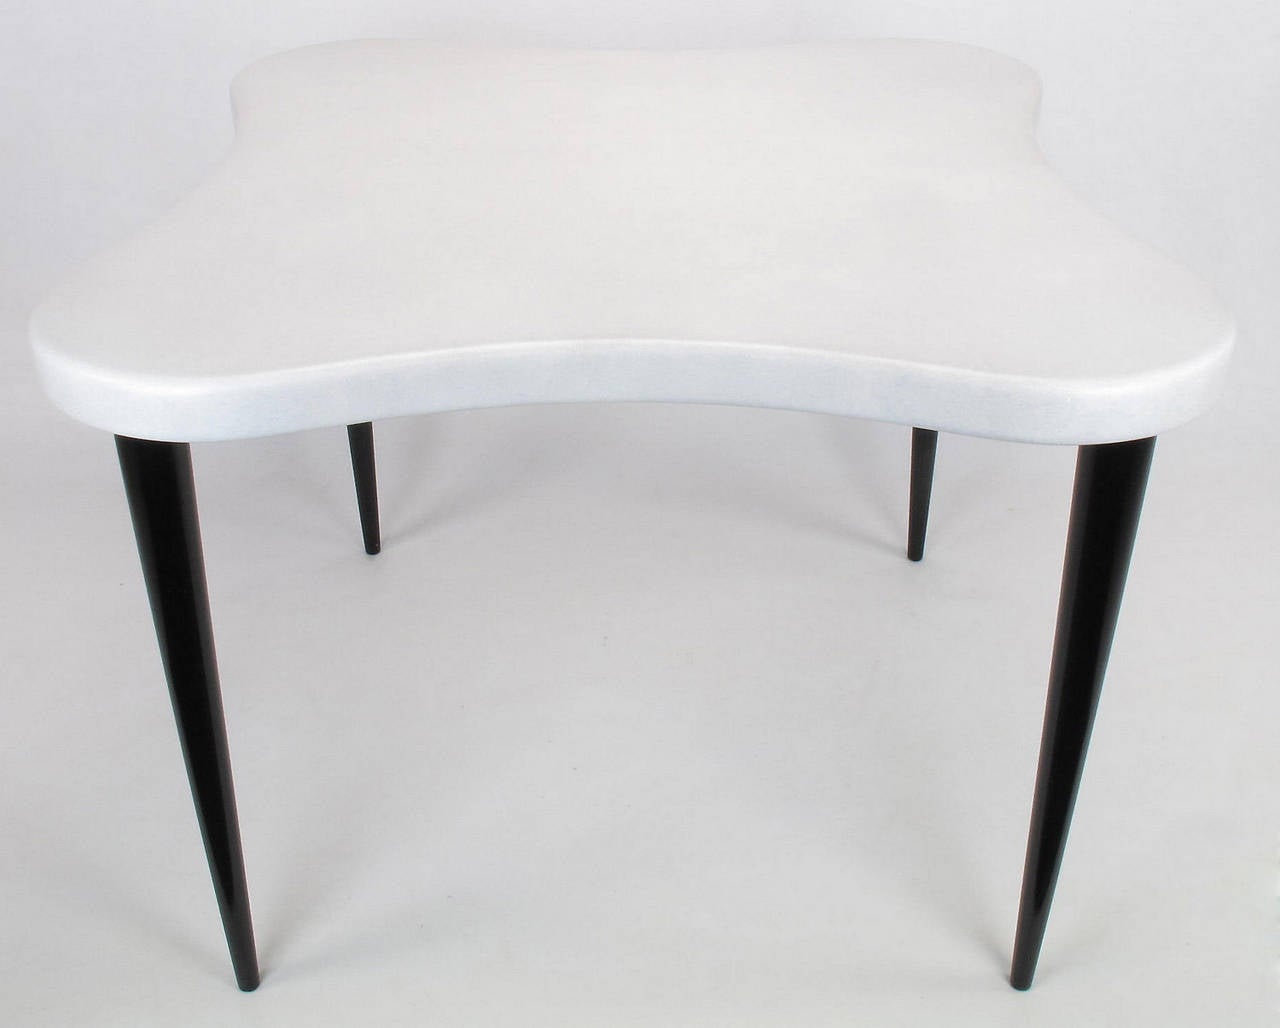 Restored Paul Frankl For Johnson Furniture, Quatrefoil Cork Top Game Table  With Ebonized Mahogany Legs